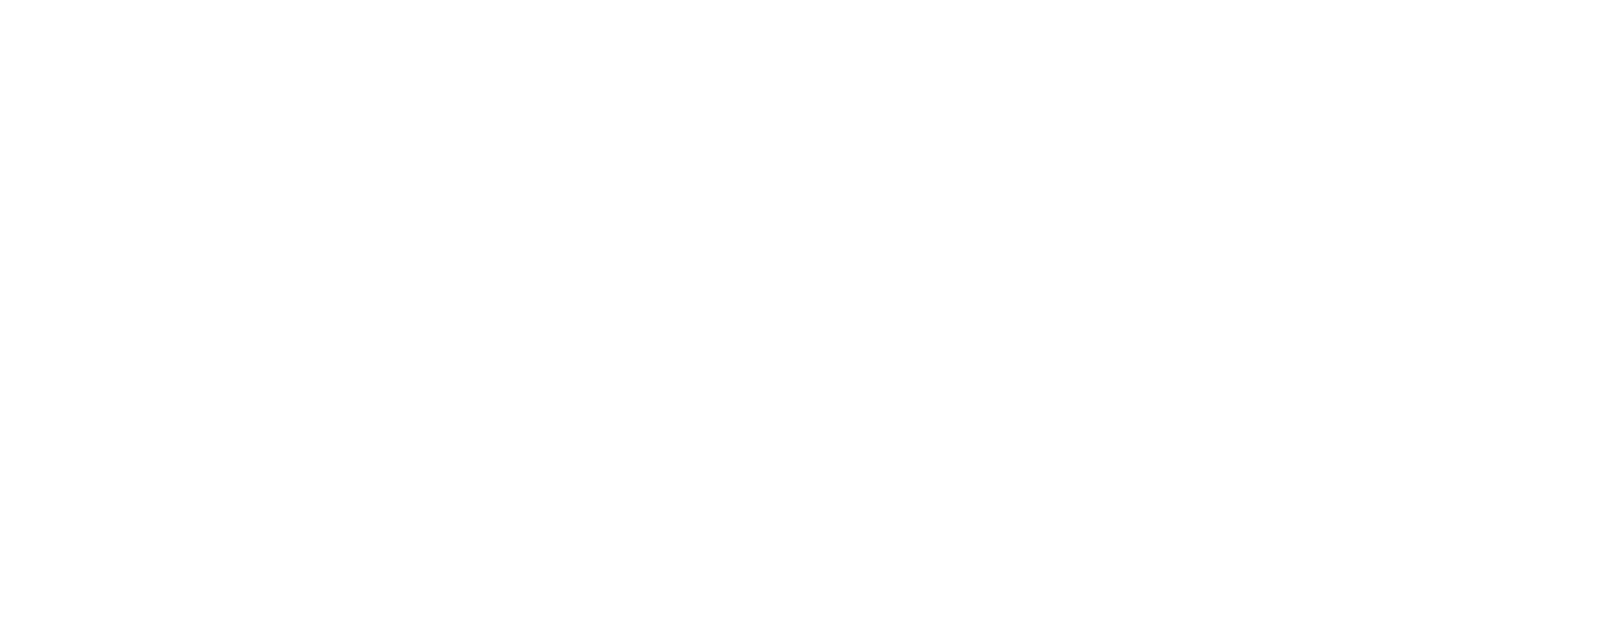 OVAC S.p.A.